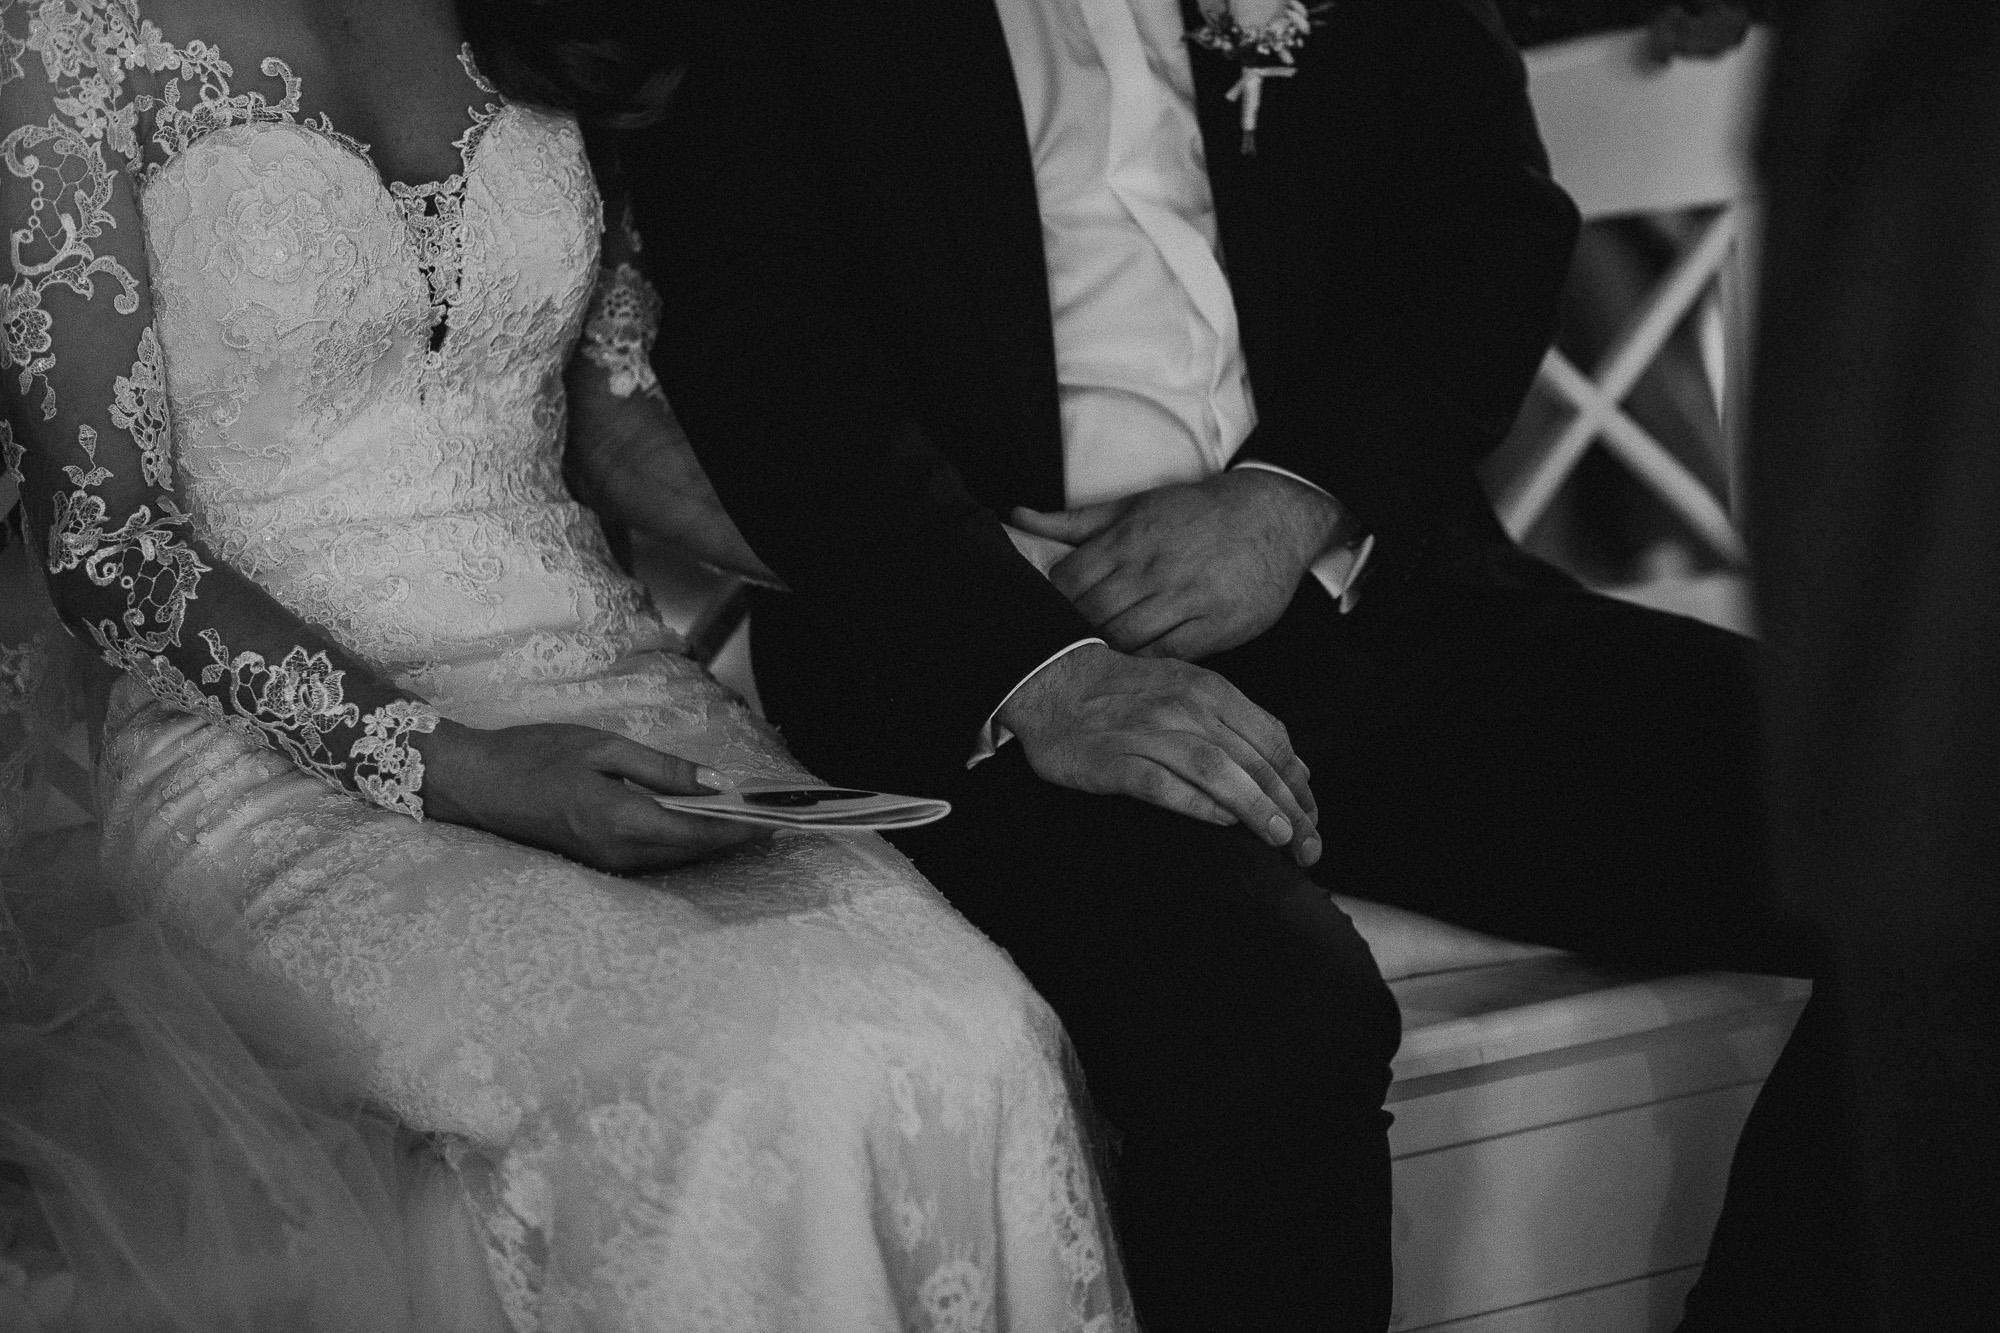 DanielaMarquardtPhotography_Hochzeitsfotograf_Düsseldorf_Köln_Mallorca_Bayern_Austria_Harz_Wedding_AileenundLennart_Weddingphotographer_Ibiza_Tuskany_Italien_Toskana_Portugal_Lissabon140